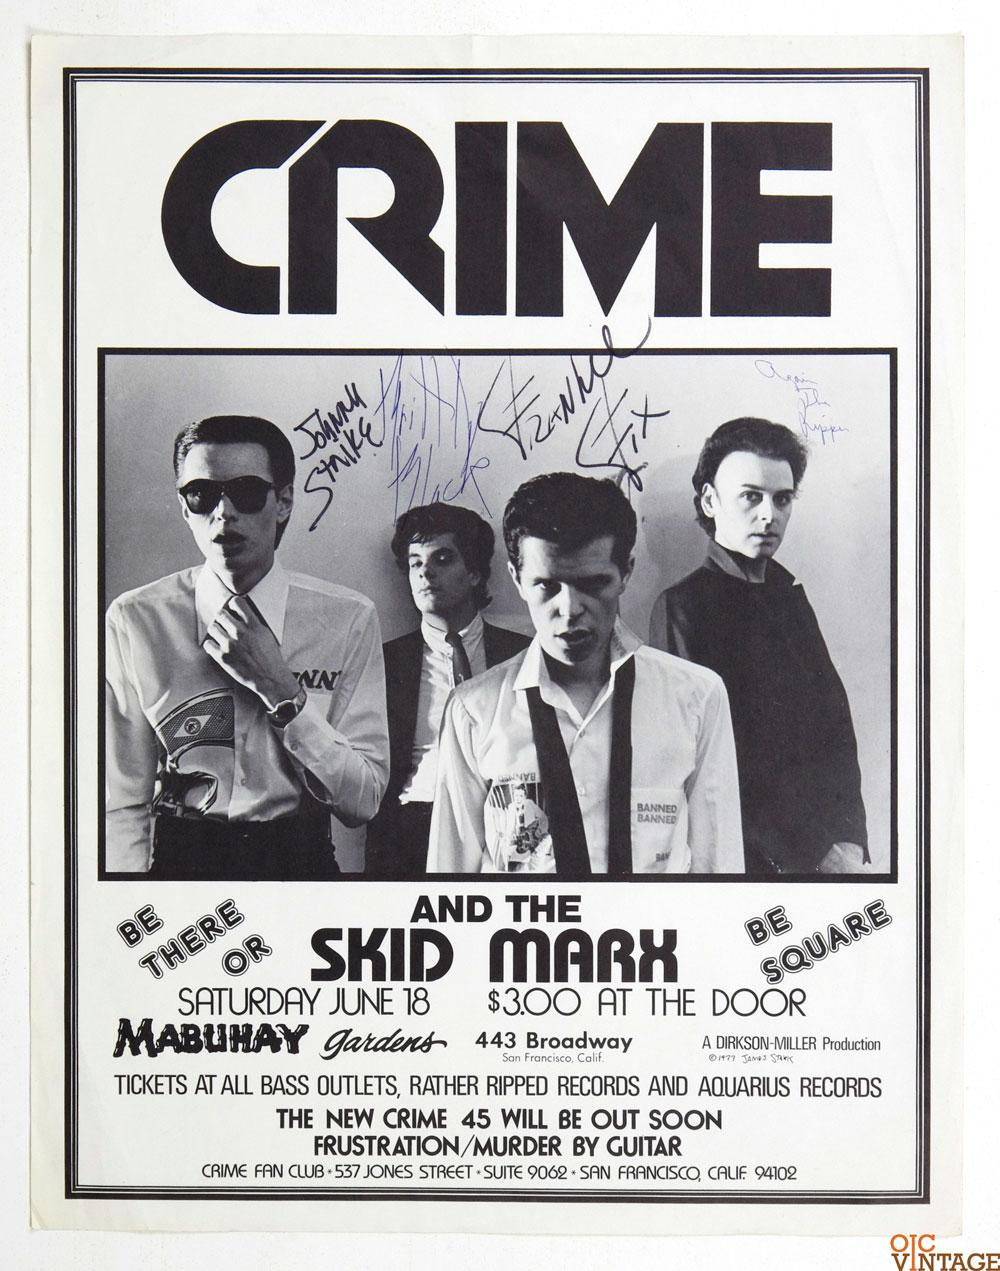 The CRIME Band Punk RockRock Vintage Collectibles @ oicVintage